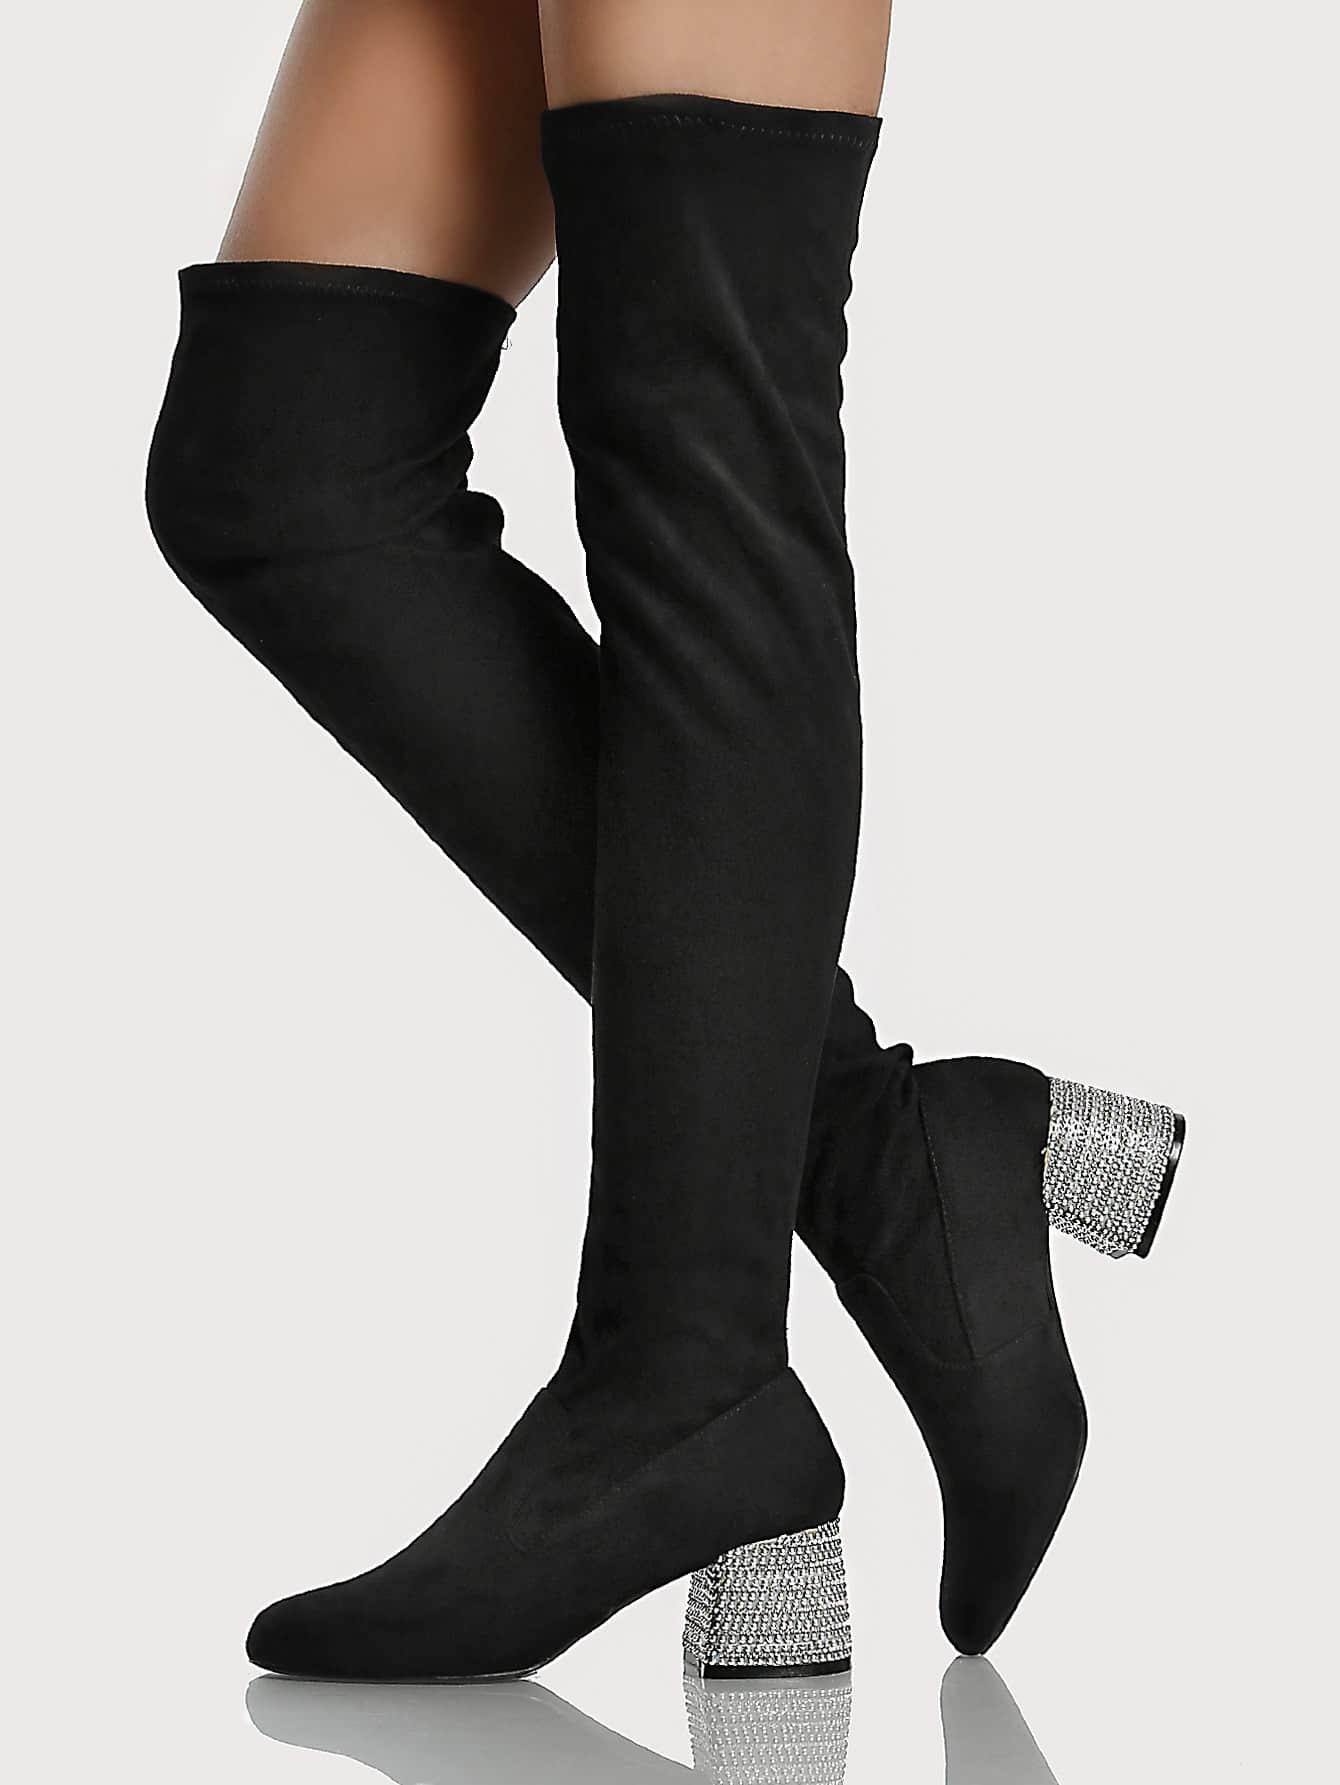 high heel shoe chair value city posture executive diamond studded boots black shein sheinside